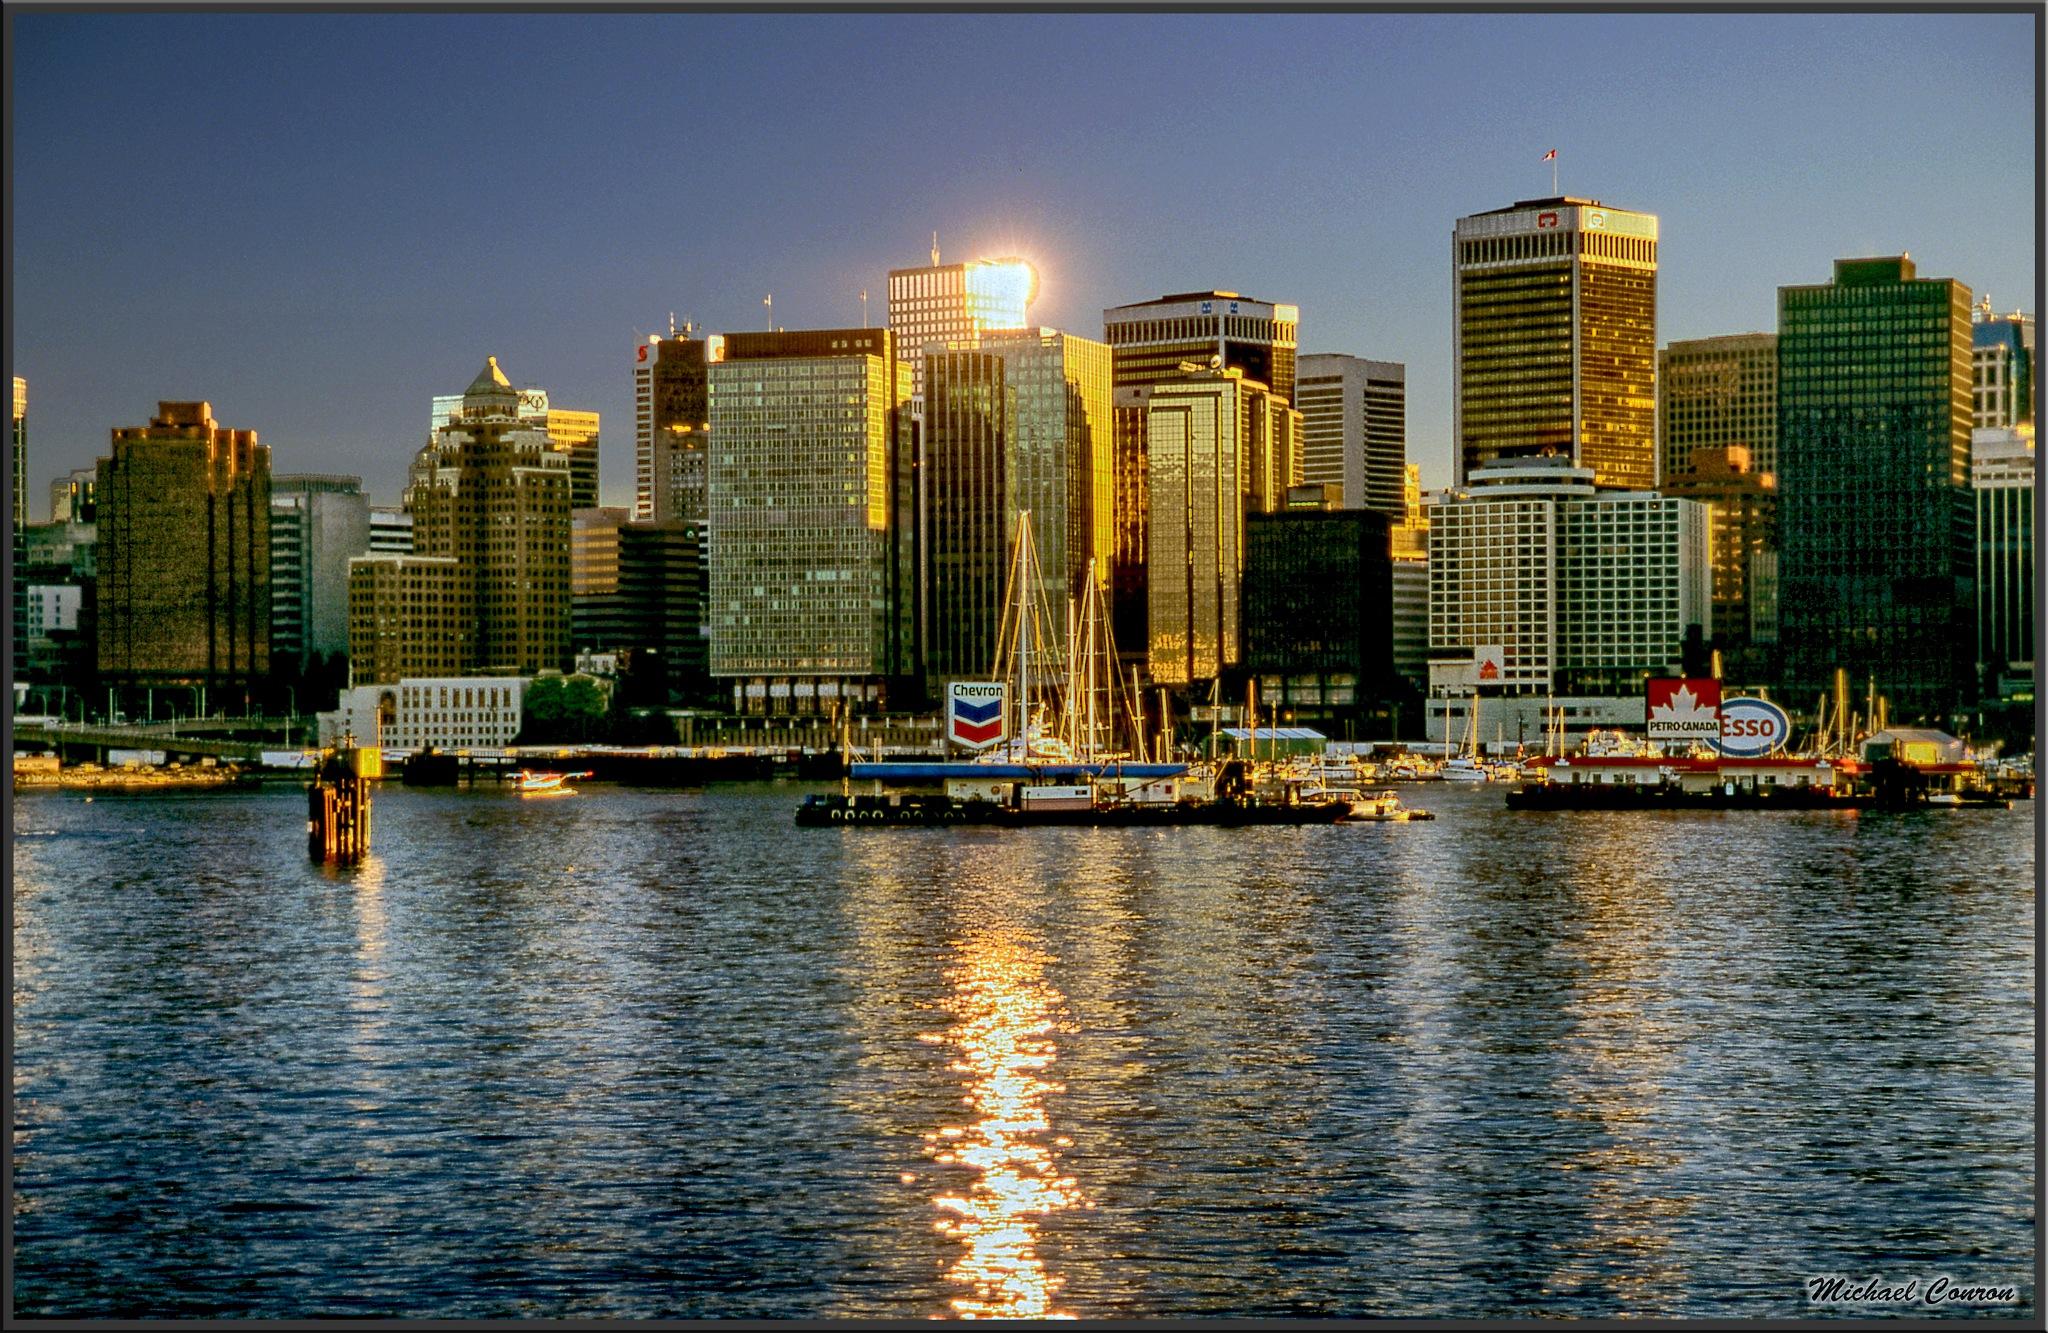 Vancouver, British Columbia by Michael Conron